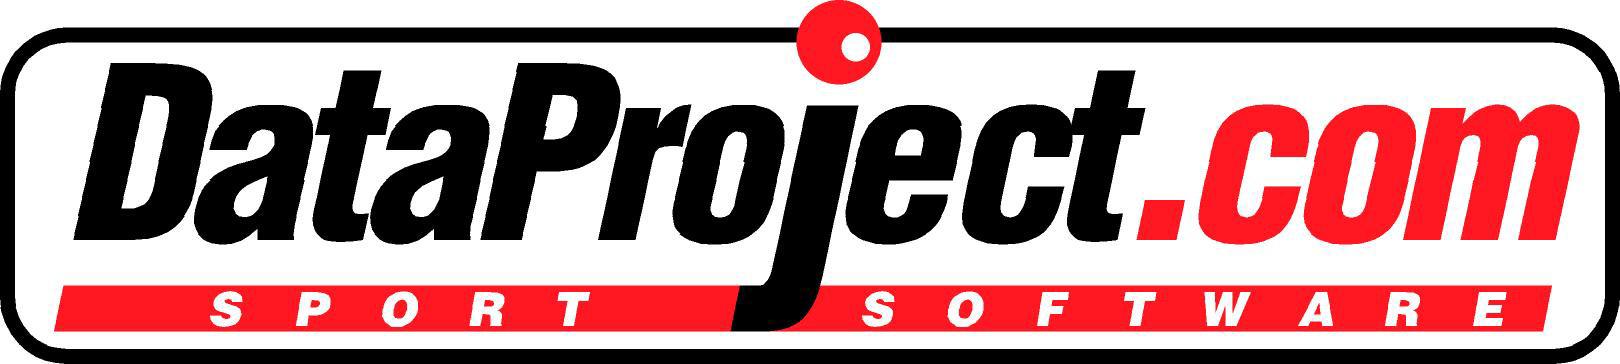 new-logo_02